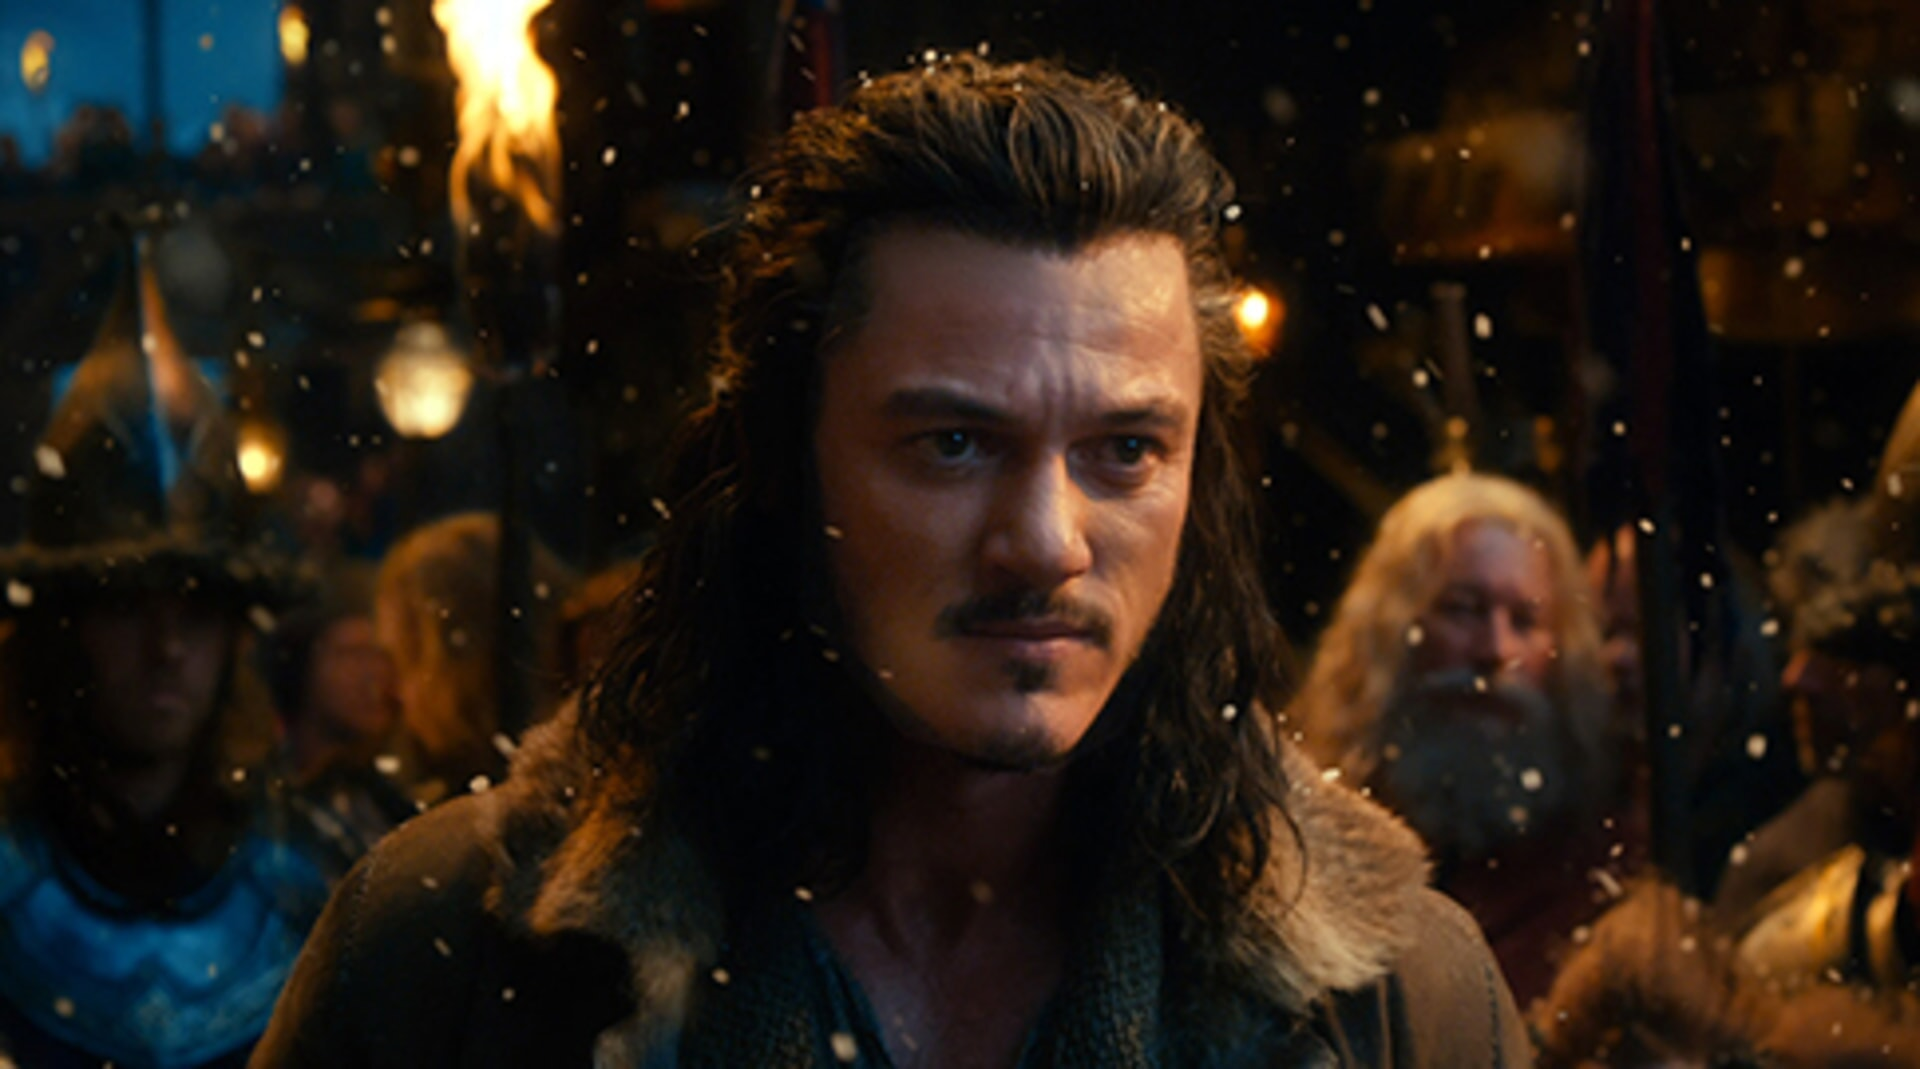 The Hobbit: The Desolation of Smaug - Image 5